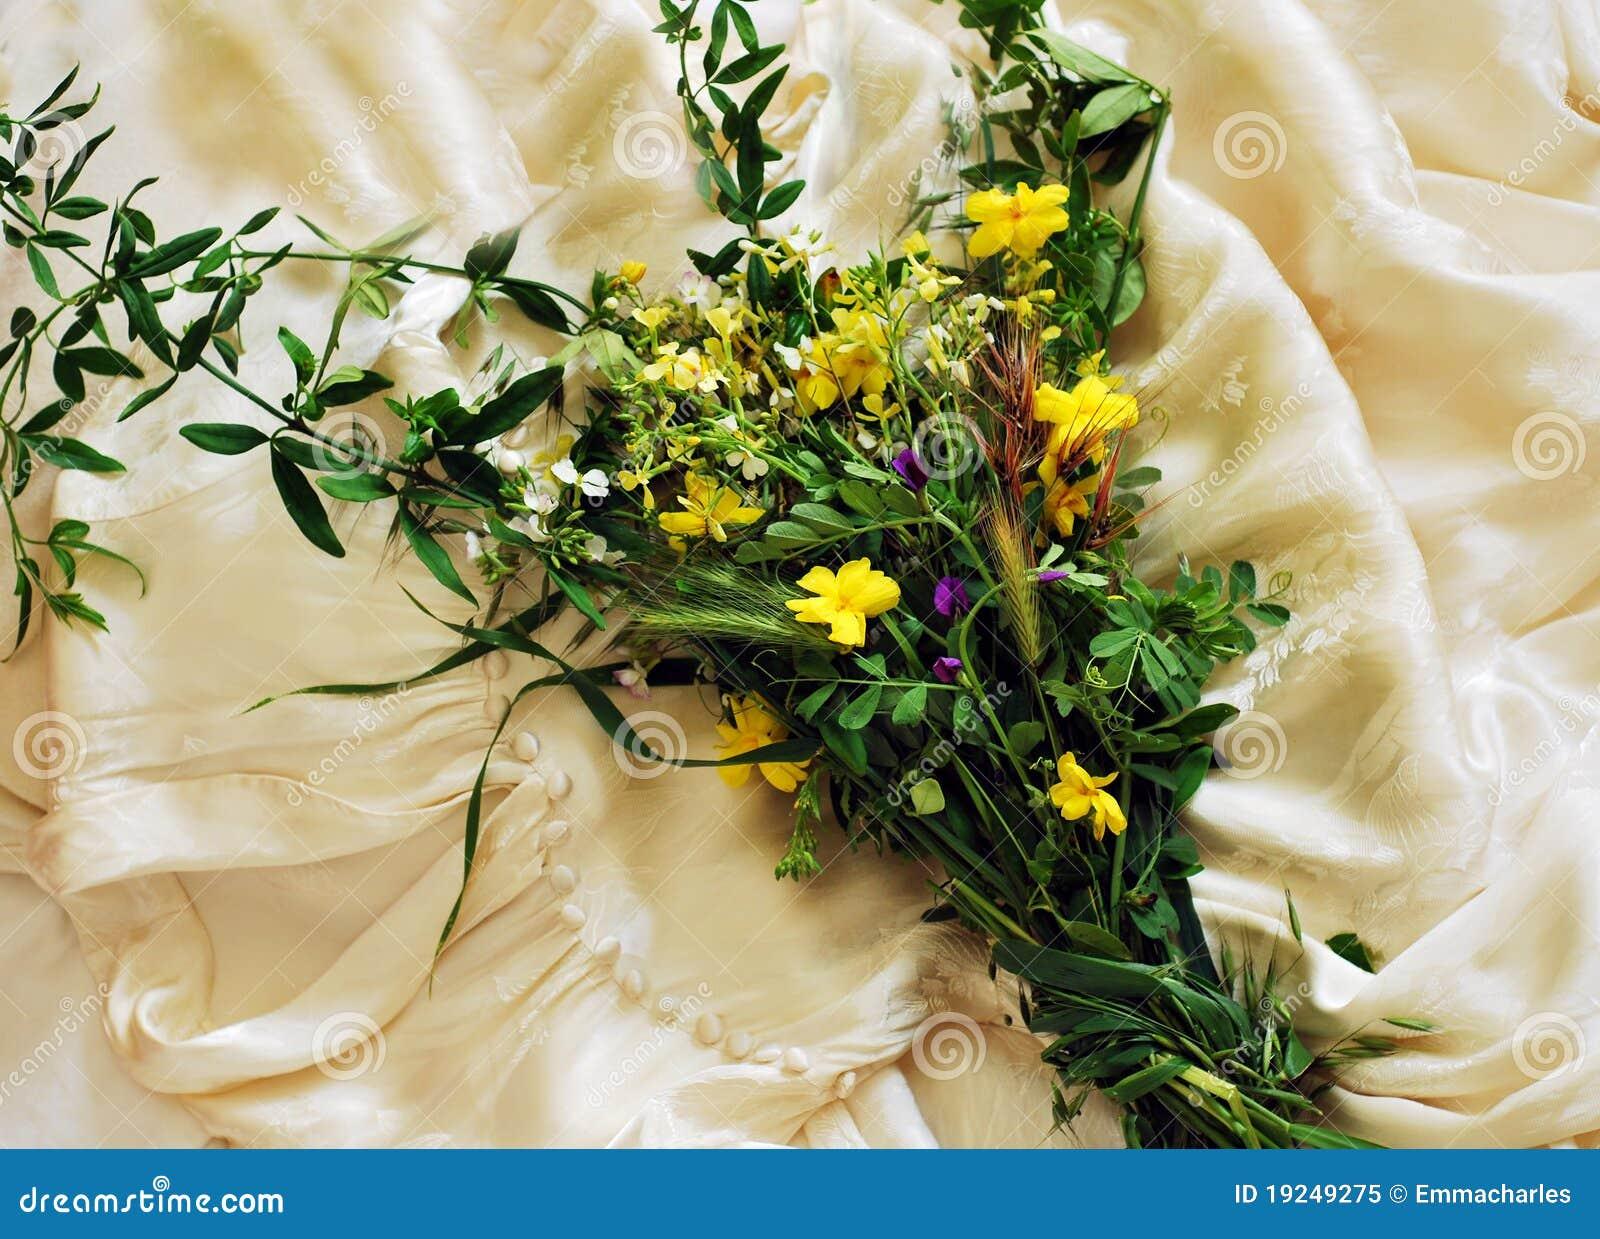 Wild flower wedding bouquetinvitationbackground stock image wild flower wedding bouquetinvitationbackground izmirmasajfo